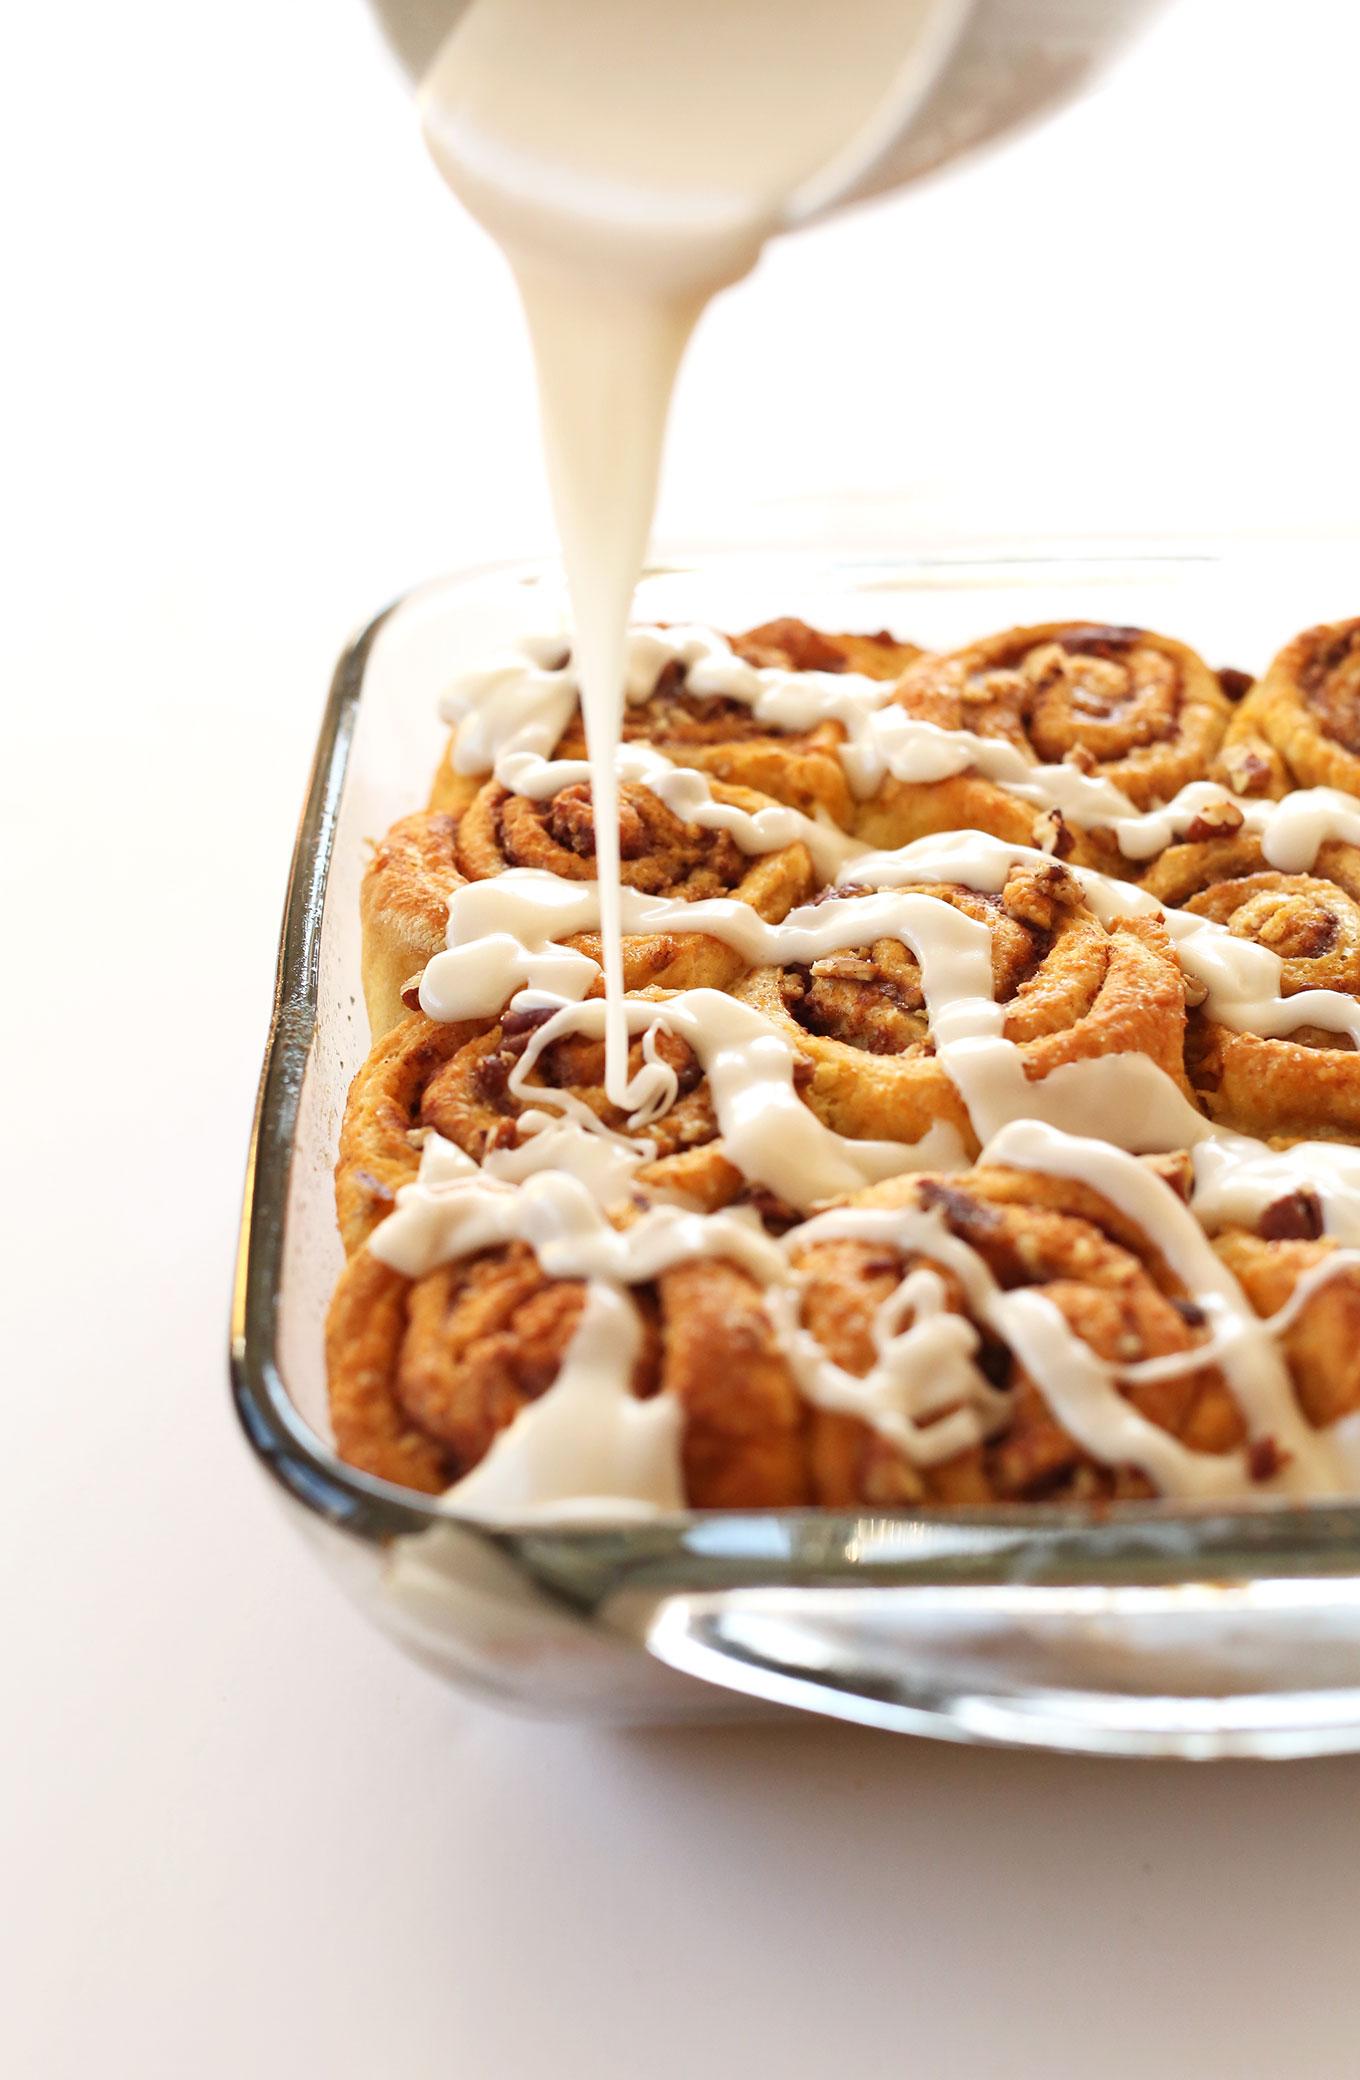 Pouring glaze onto a pan of Vegan Pumpkin Cinnamon Rolls